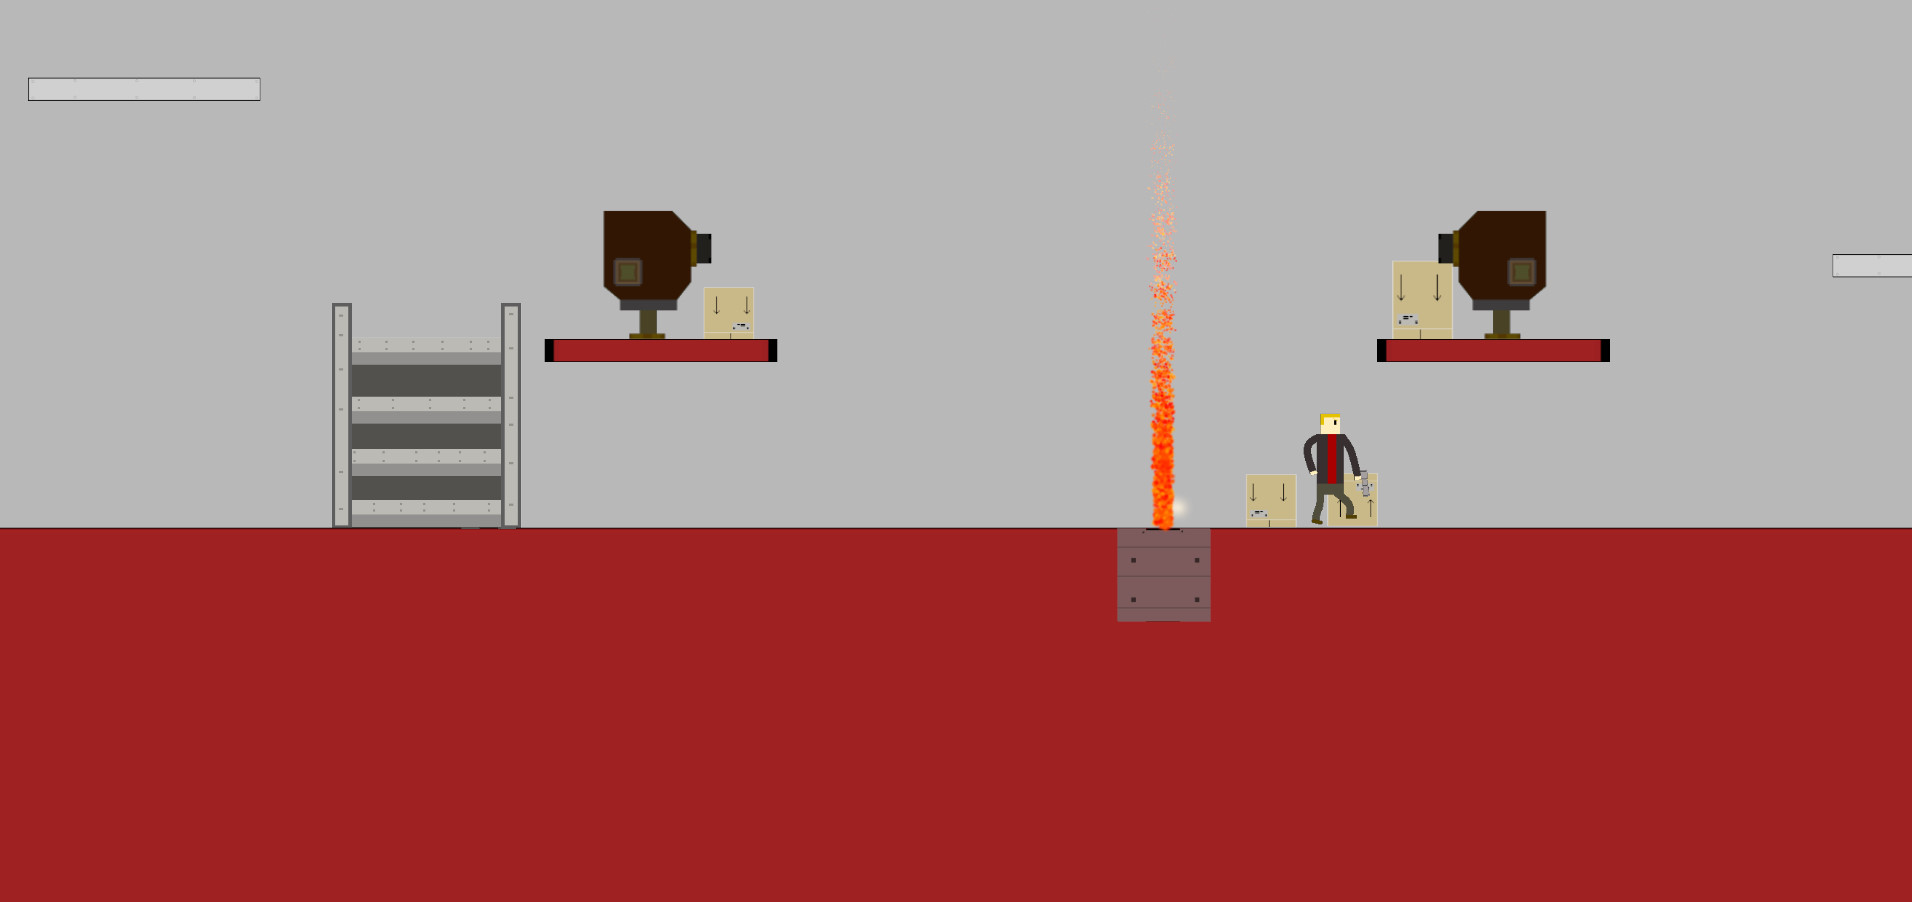 screenshot level 2_3.jpg